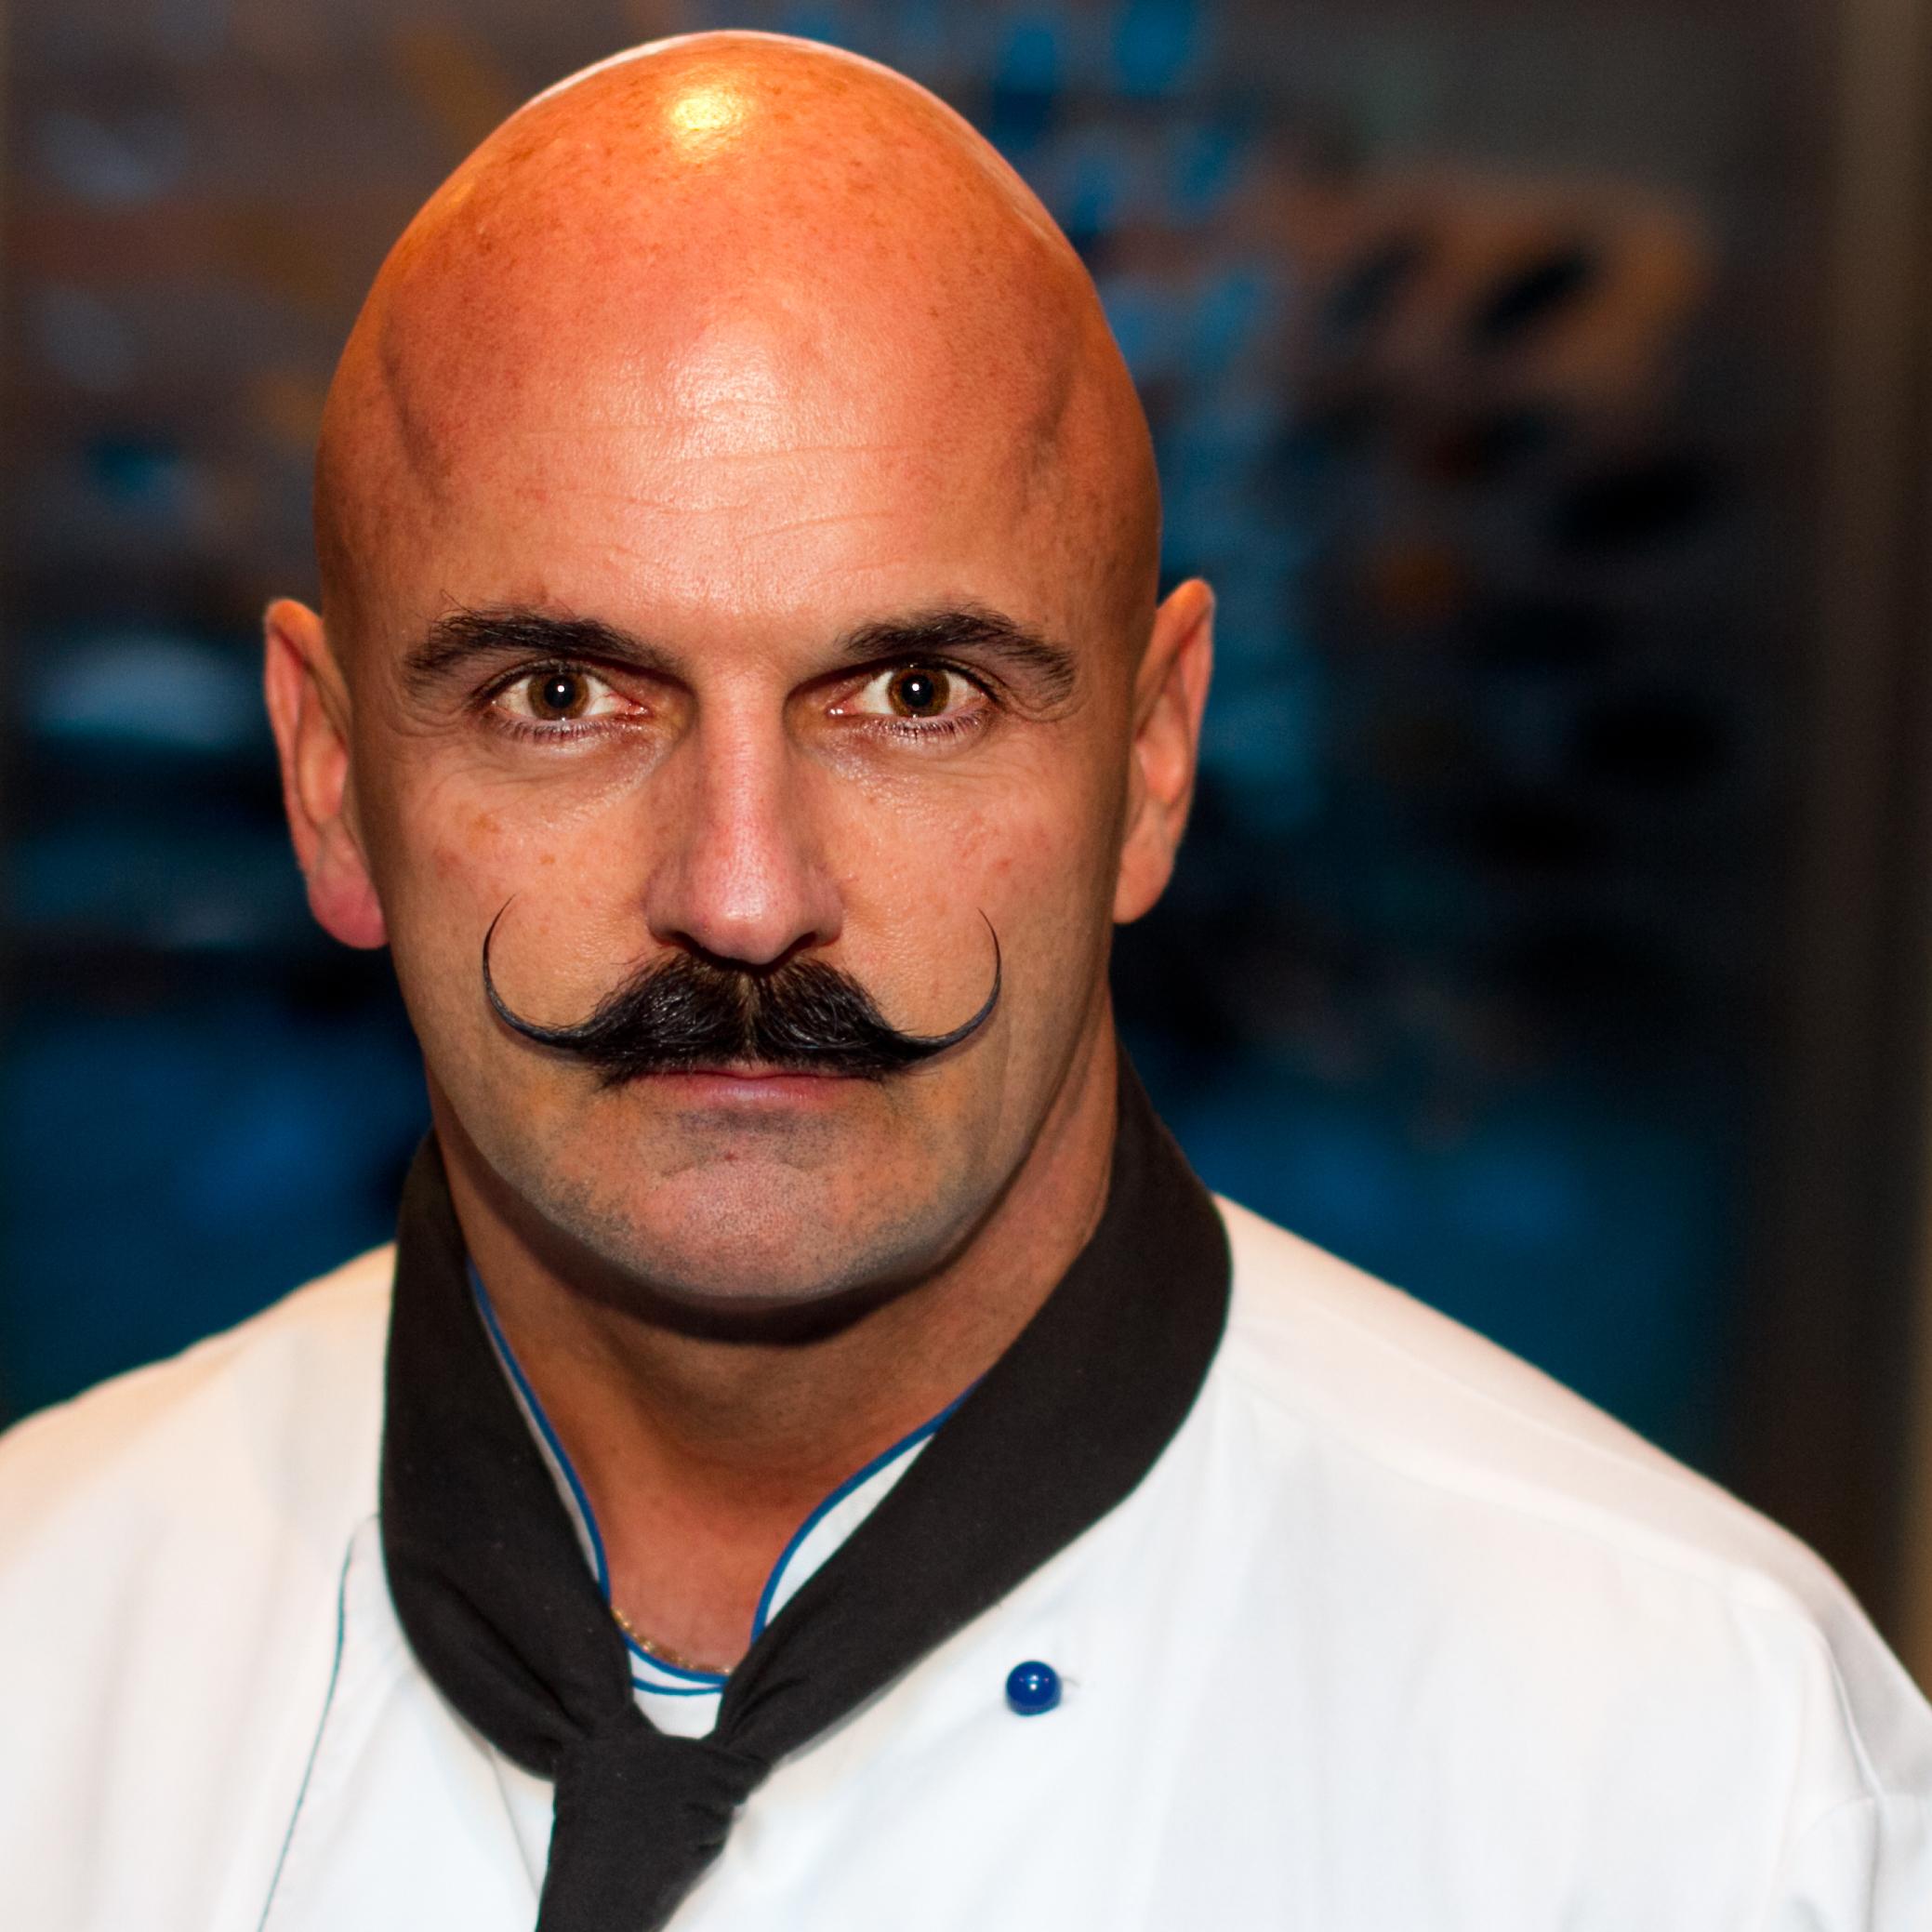 Chef-0704.jpg